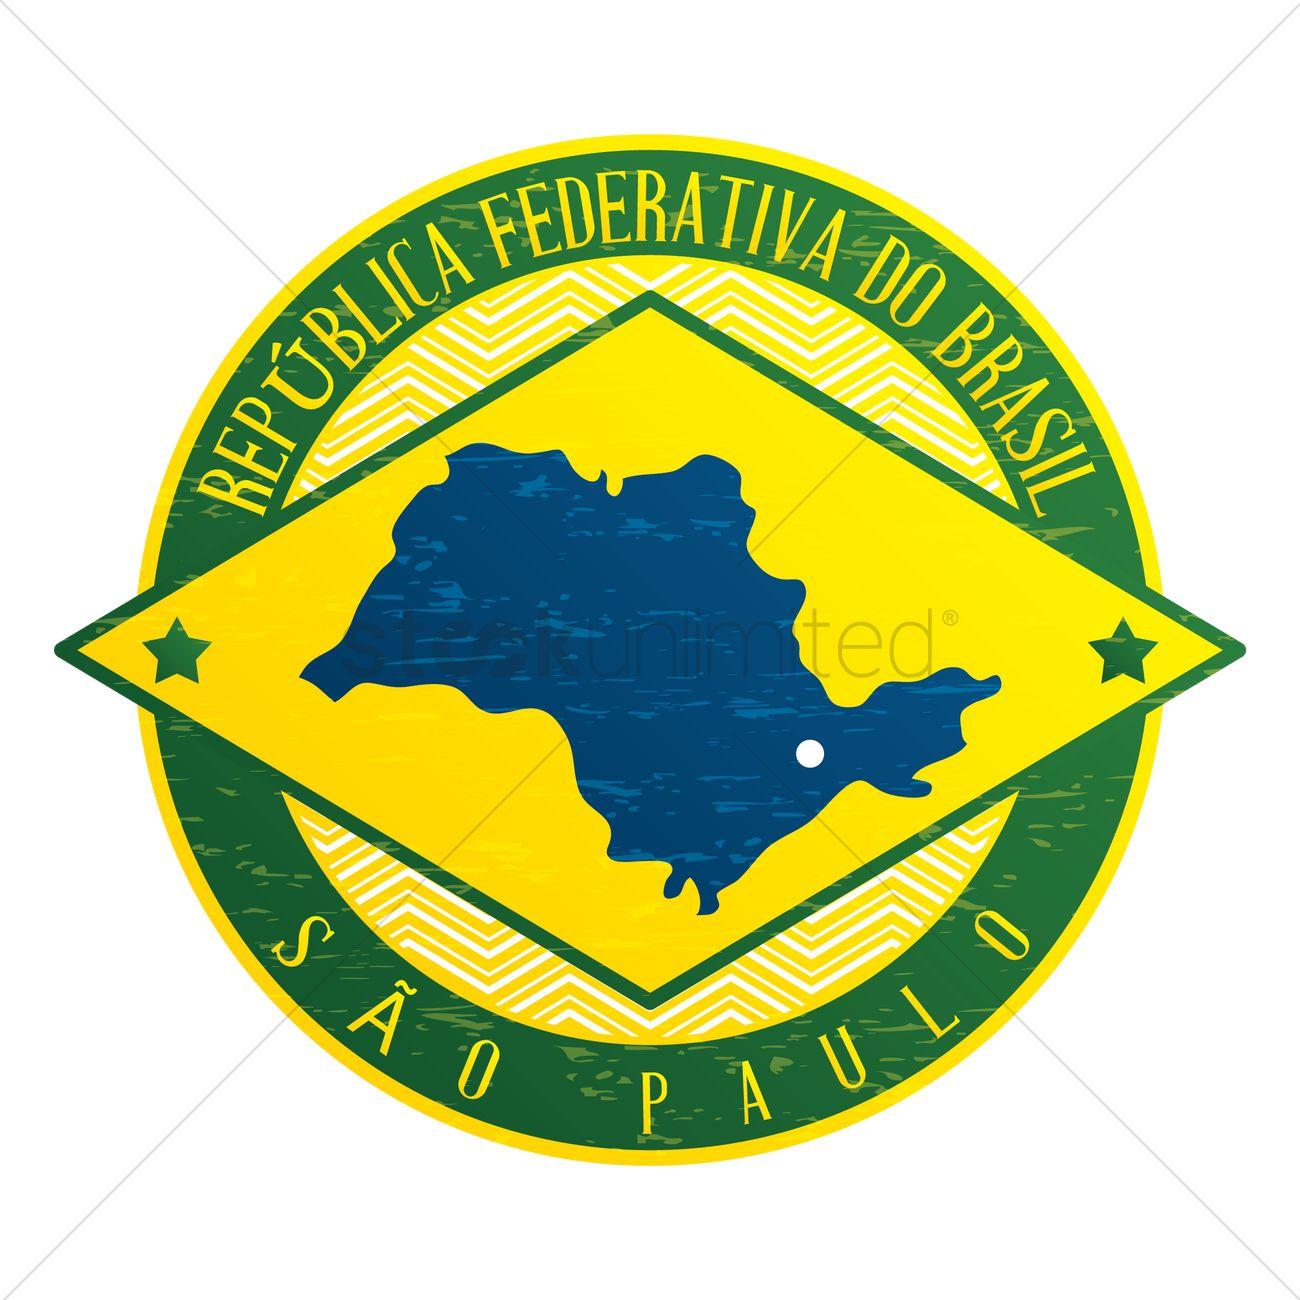 Sao Paulo State Map.Sao Paulo State Map Vector Image 1581032 Stockunlimited